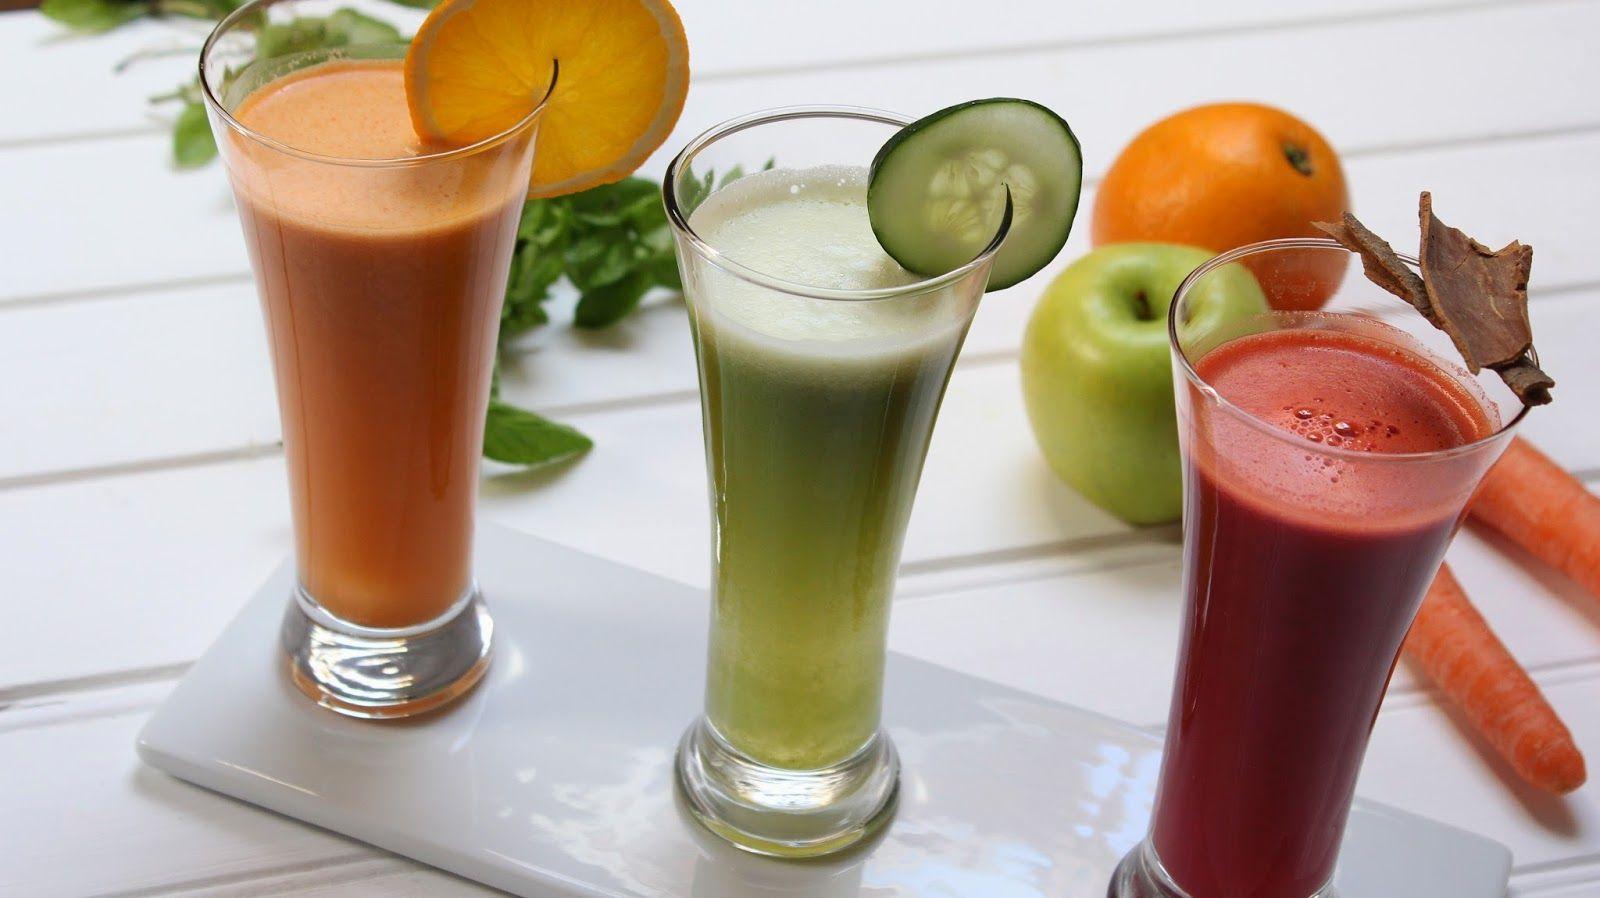 Dieta saludable para perder peso poco a poco picture 7